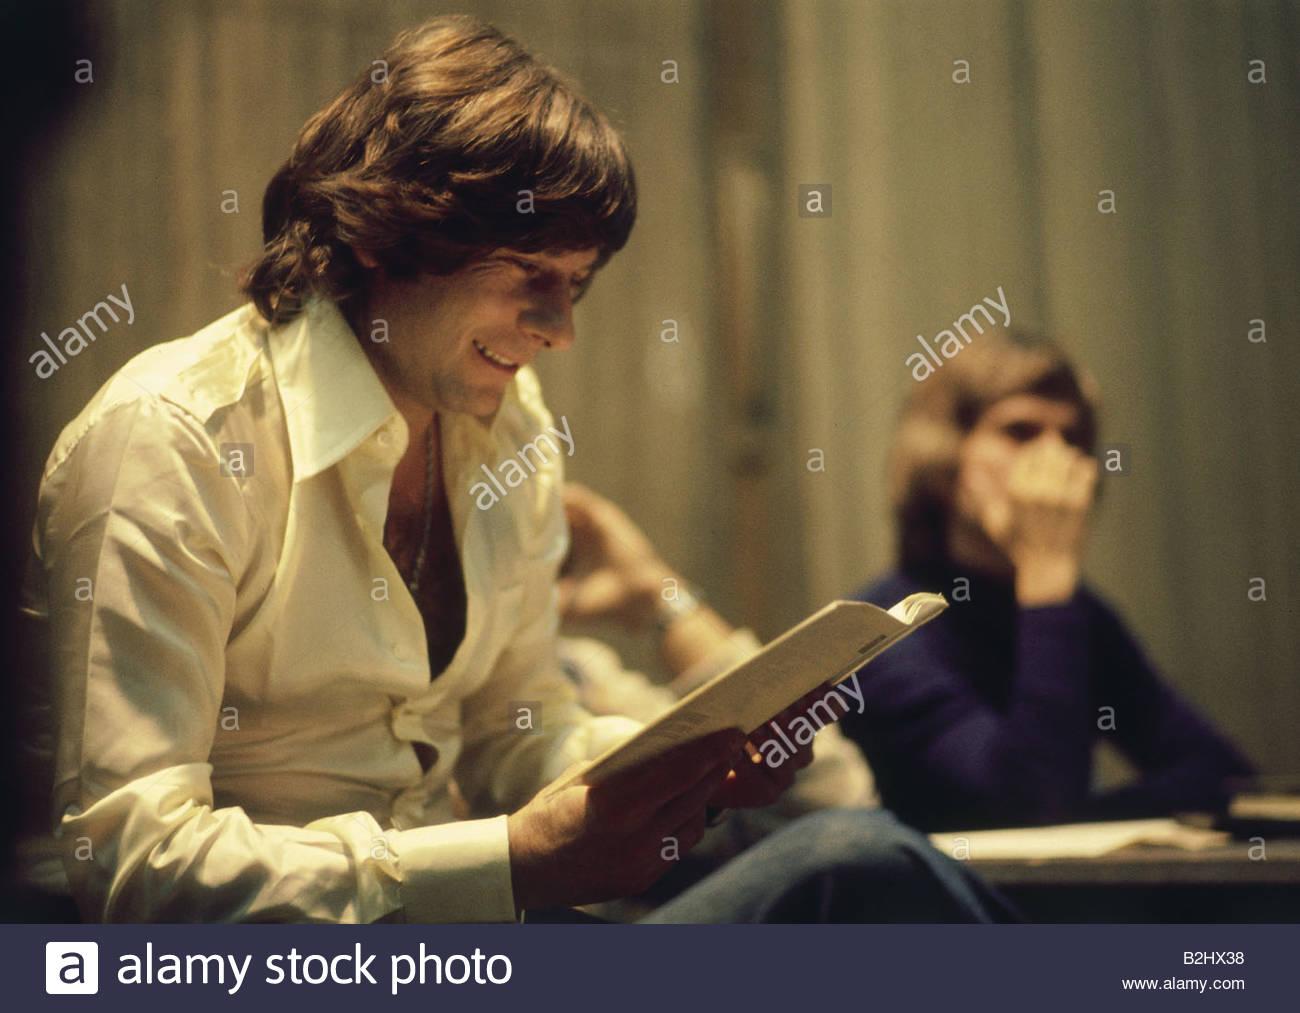 Polanski, Roman, * 13.8.1933, Polish director and actor, half length, during rehearsal, 1970s, birth name: Roman - Stock Image